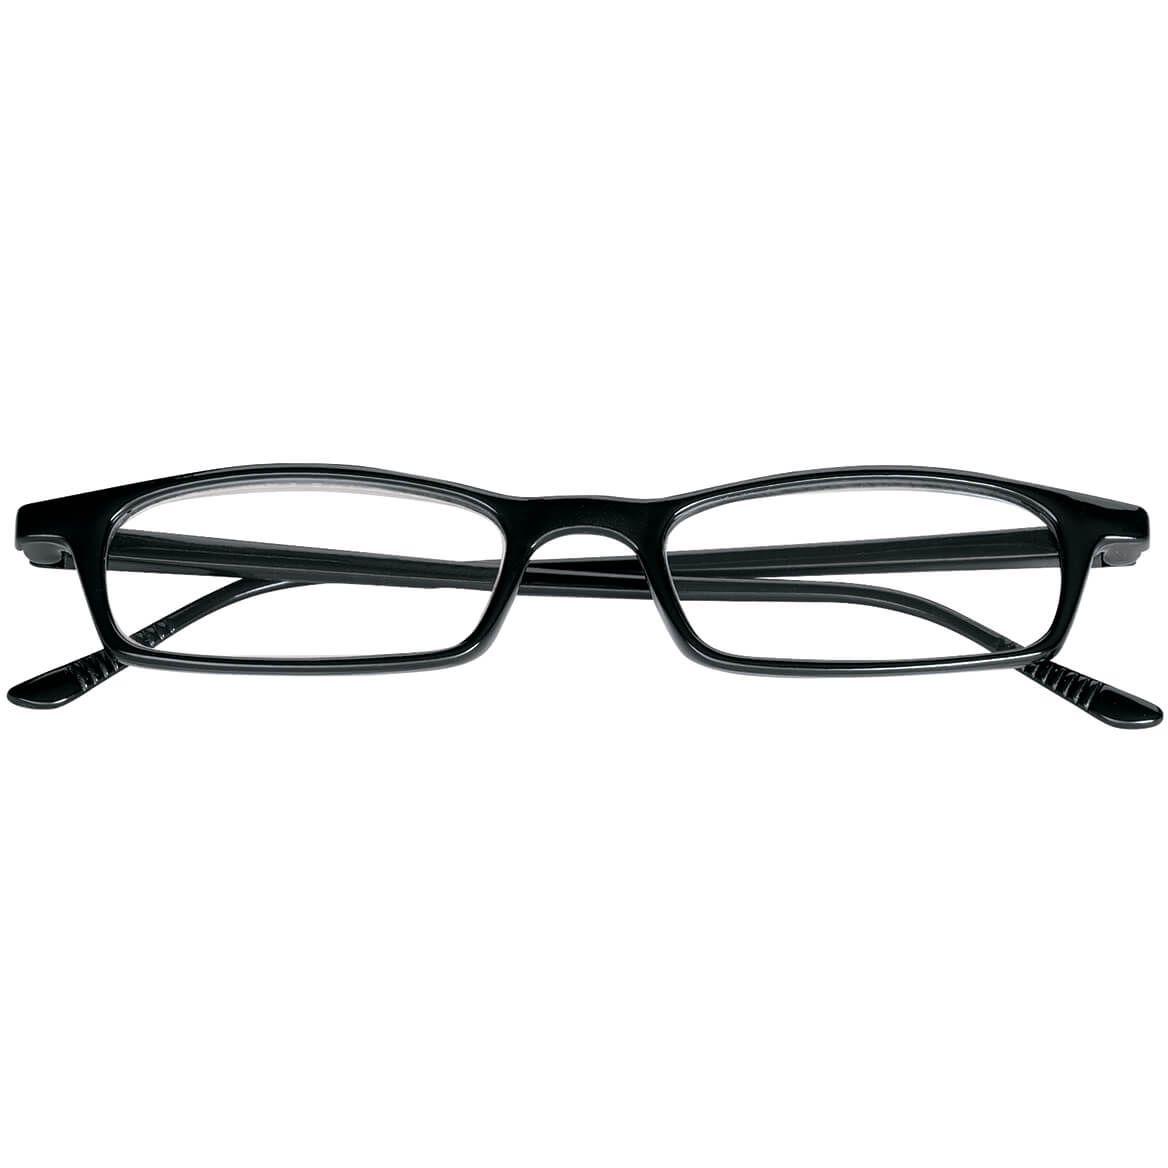 3 Pair Value Pack Reading Glasses-337153